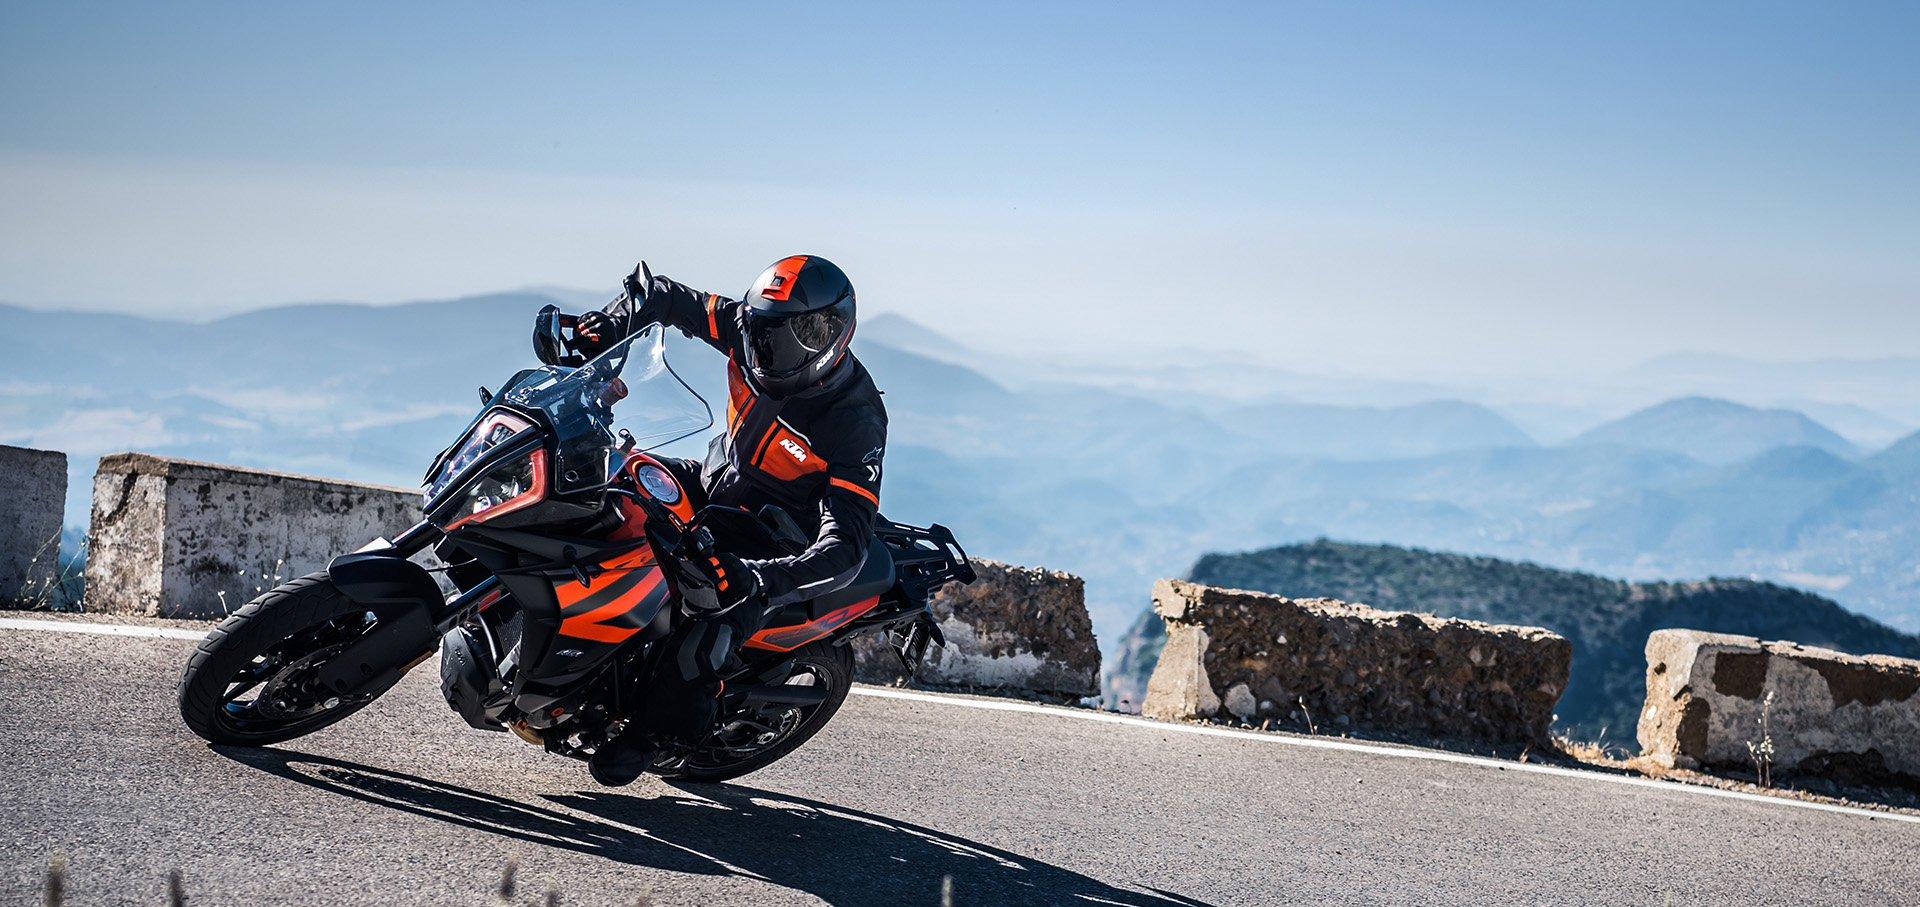 KTM 1290 Super Adventure S 2019